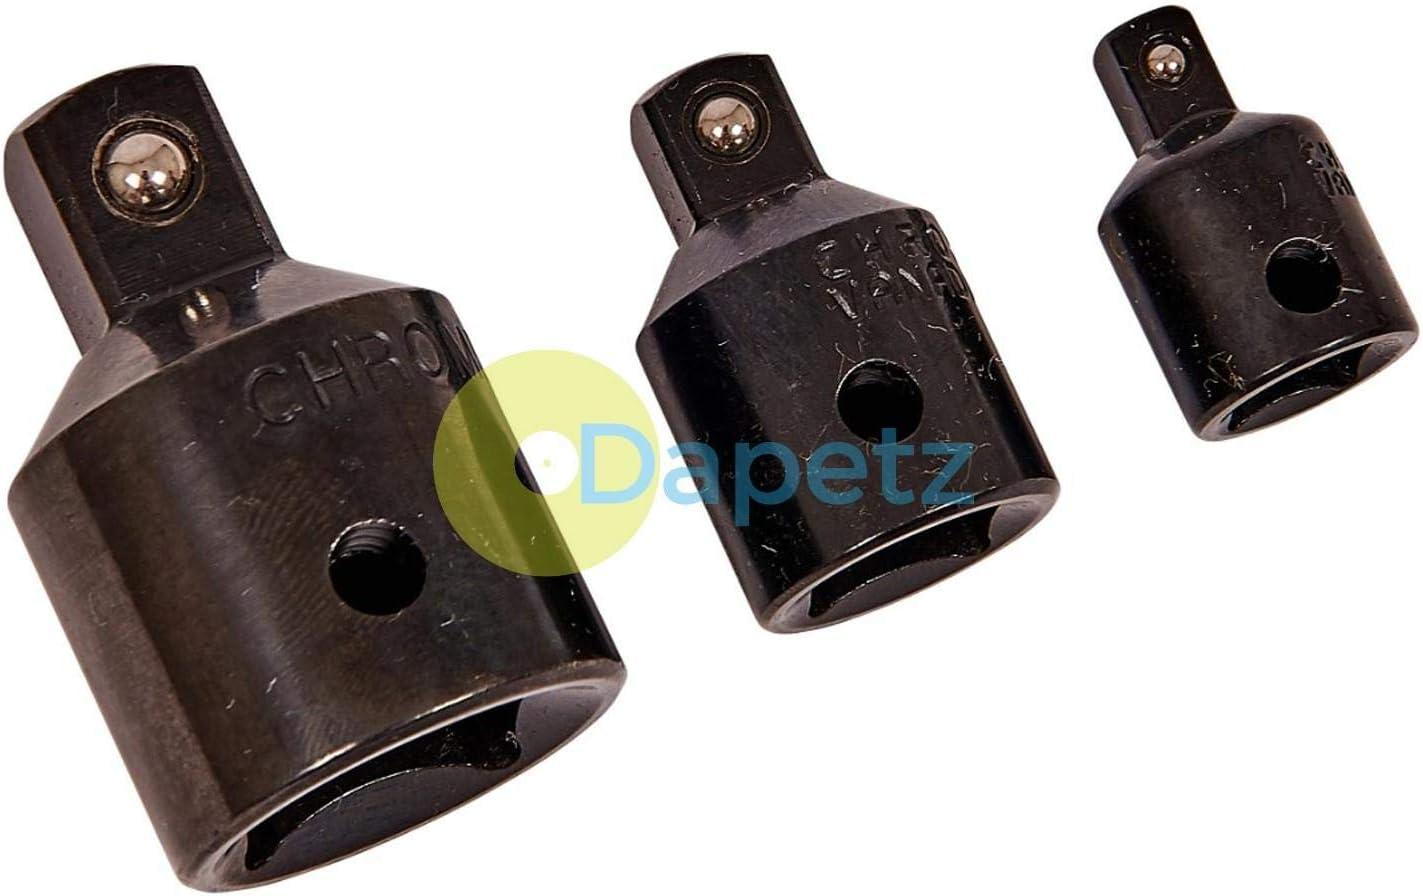 Dapetz /® Impact Socket Reducer Set Step Down Adaptors 3//4 To 1//2 To 3//8 To 1//4 Drives